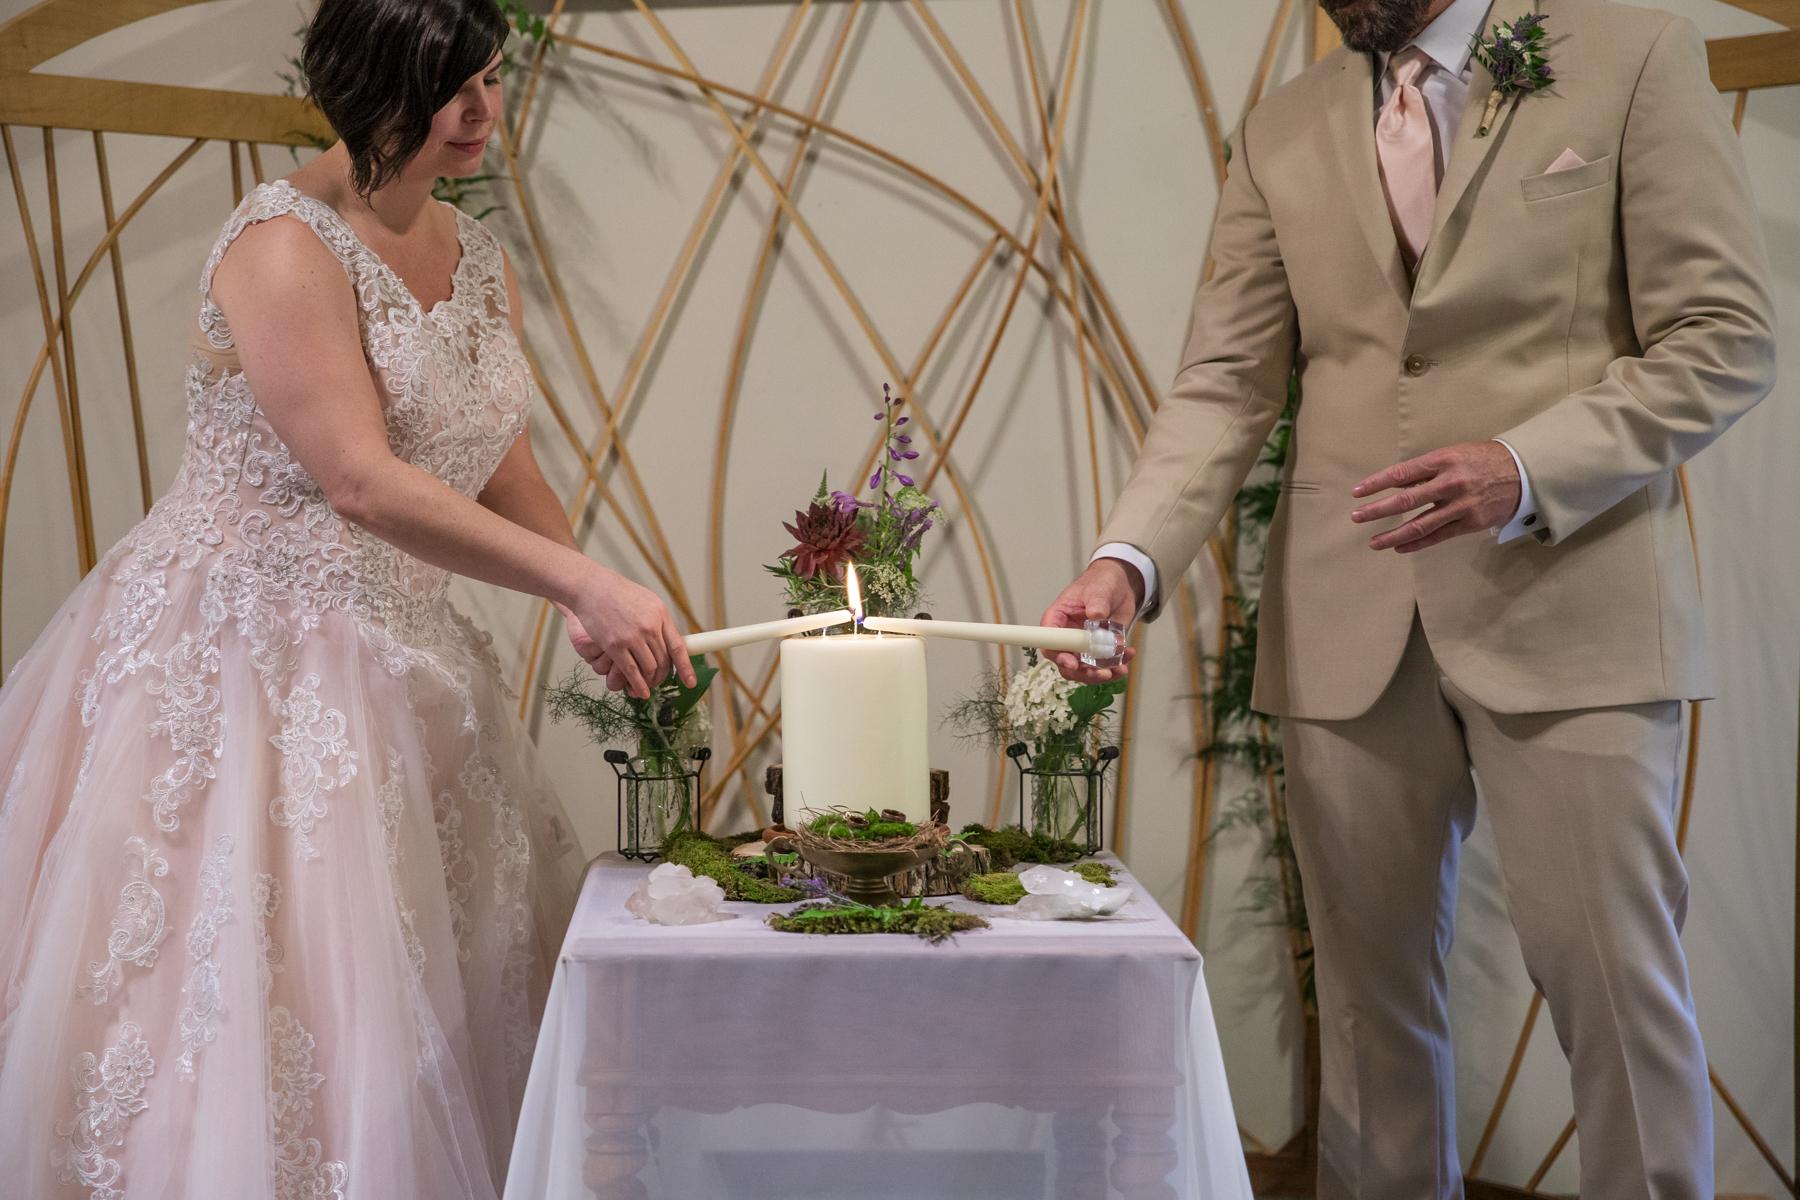 Avyanna and Phoenix Wedding- Photos by Studio Misha_BLOG-144.jpg